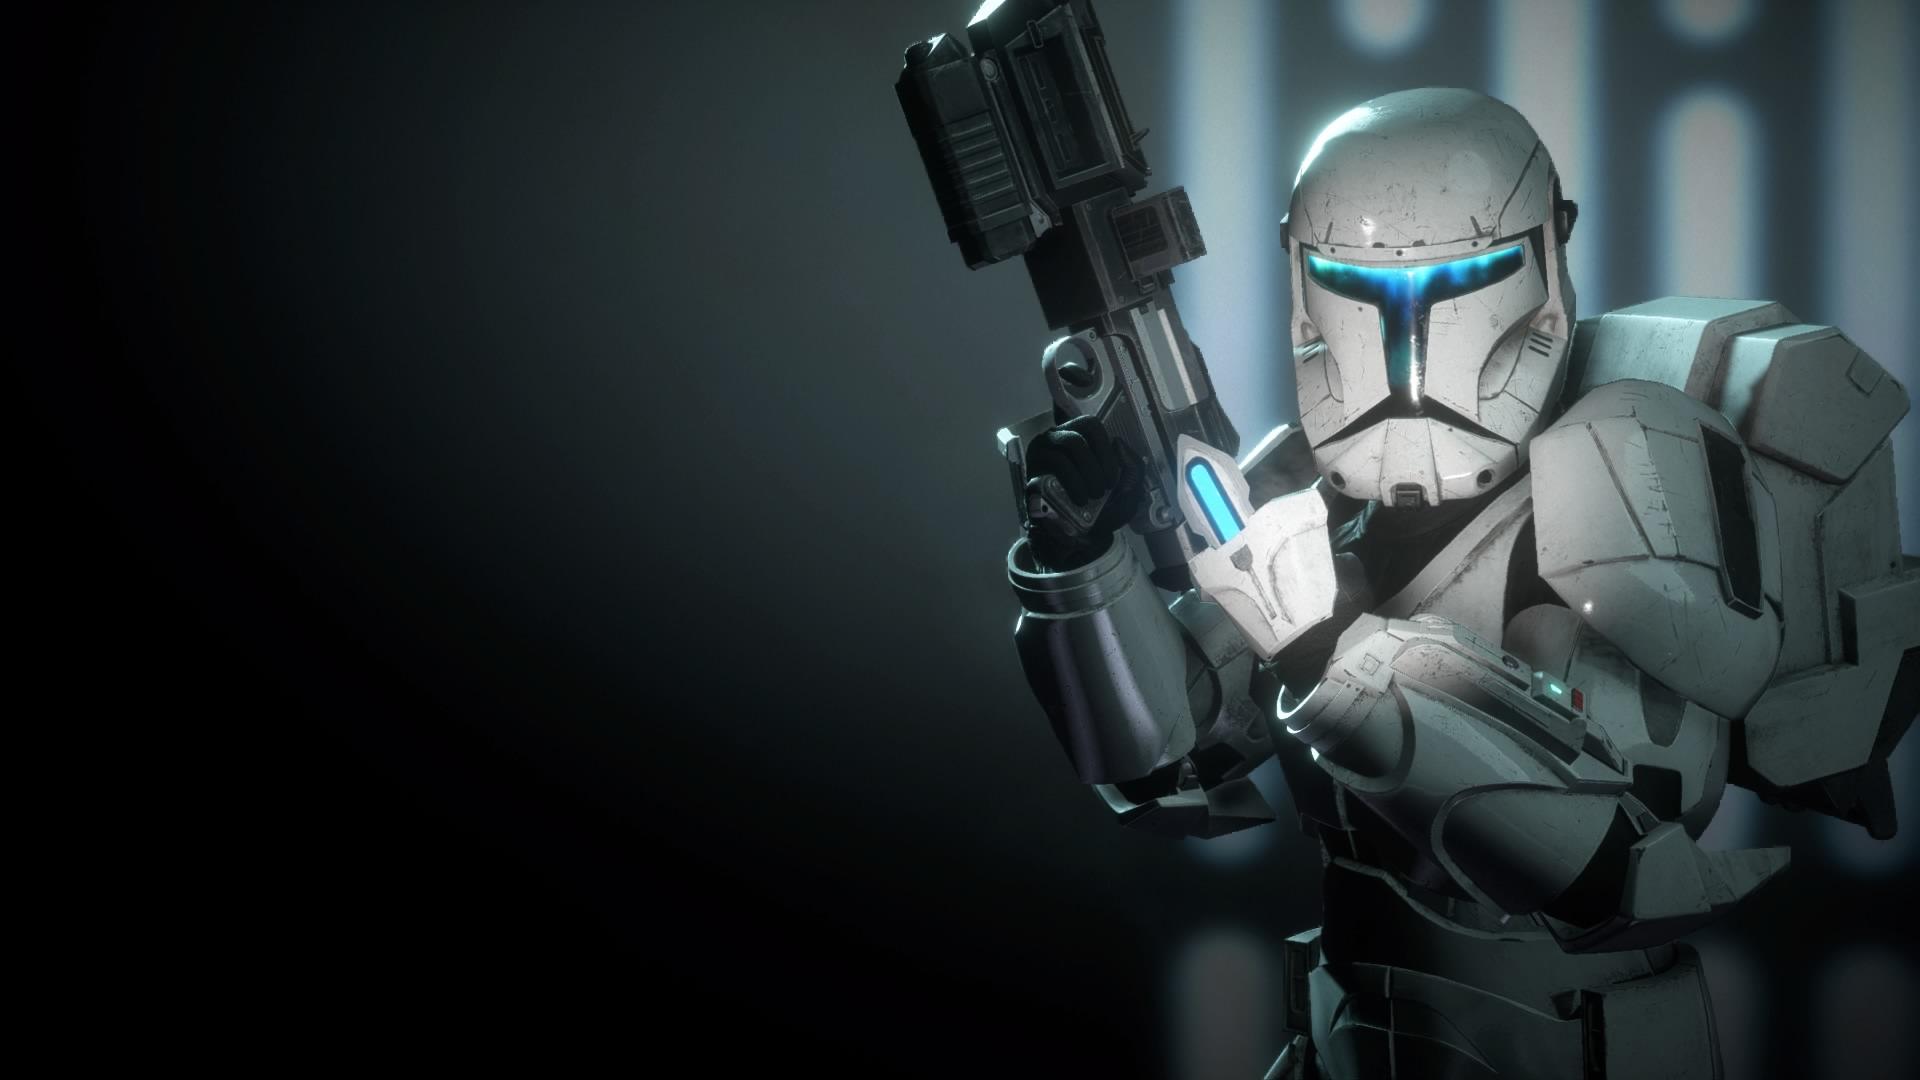 Star Wars Battlefront 2 Clone Commando Wallpaper By Bluemoh On